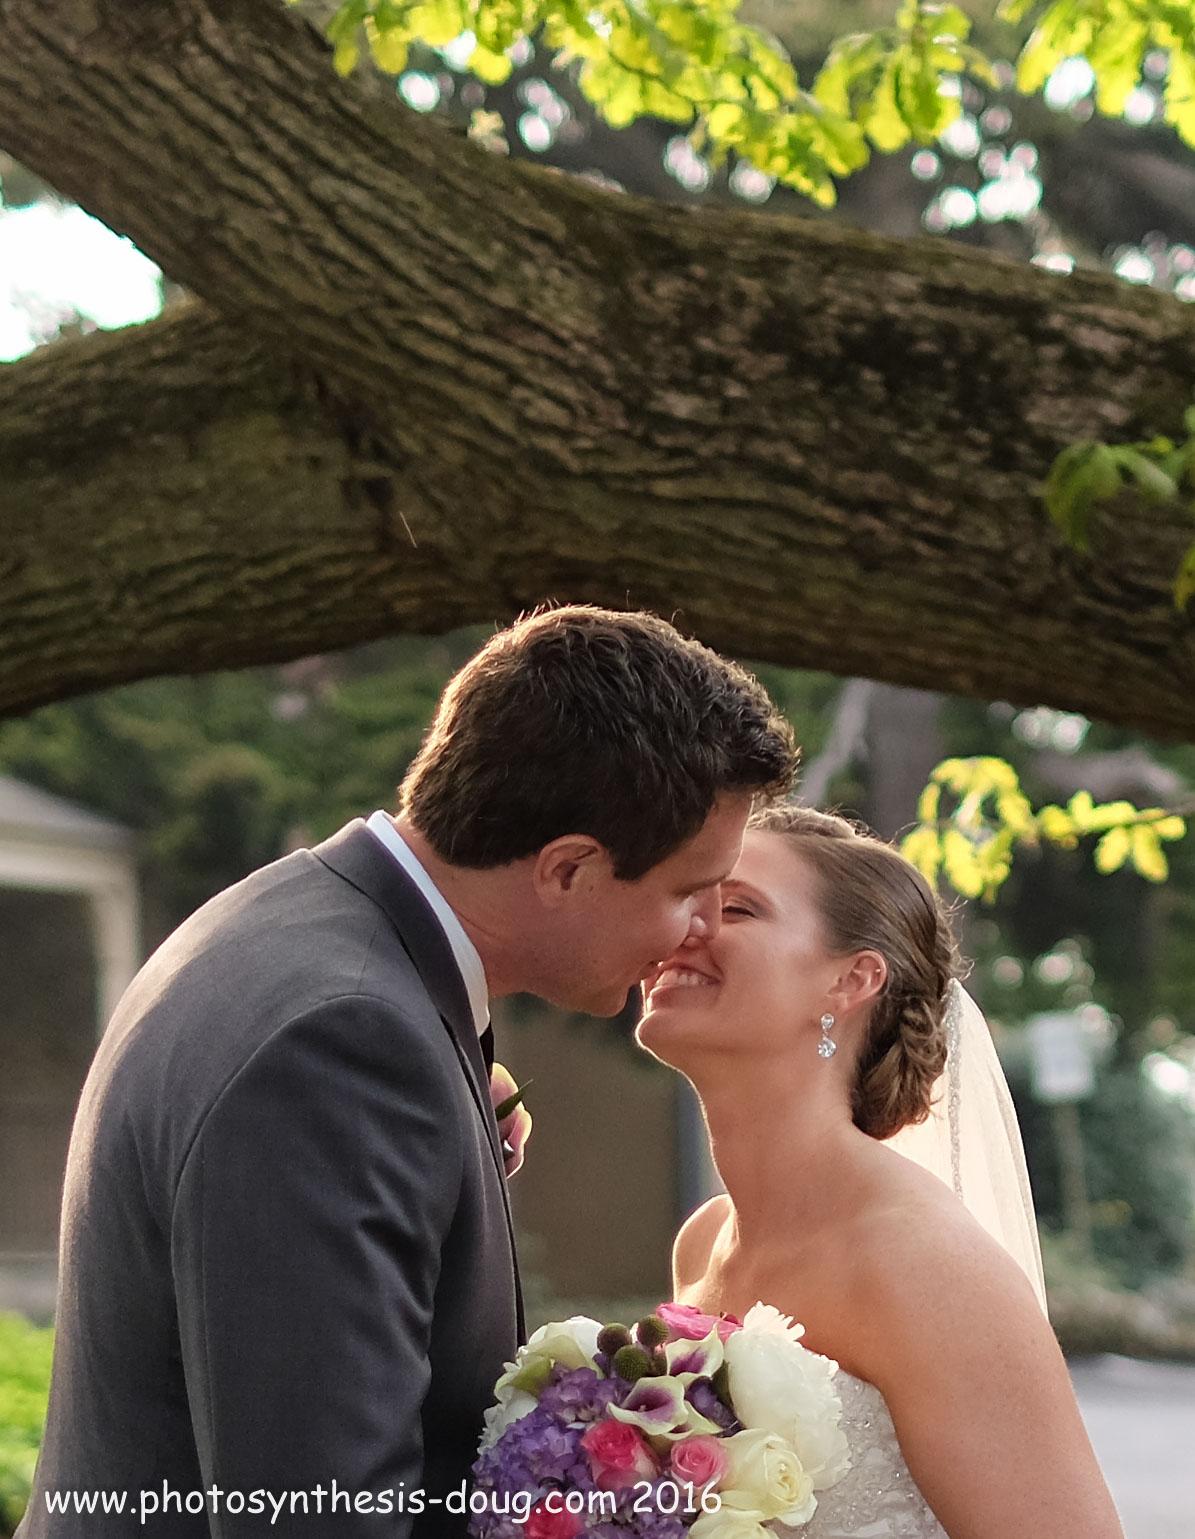 Brides by Doug-5207.jpg